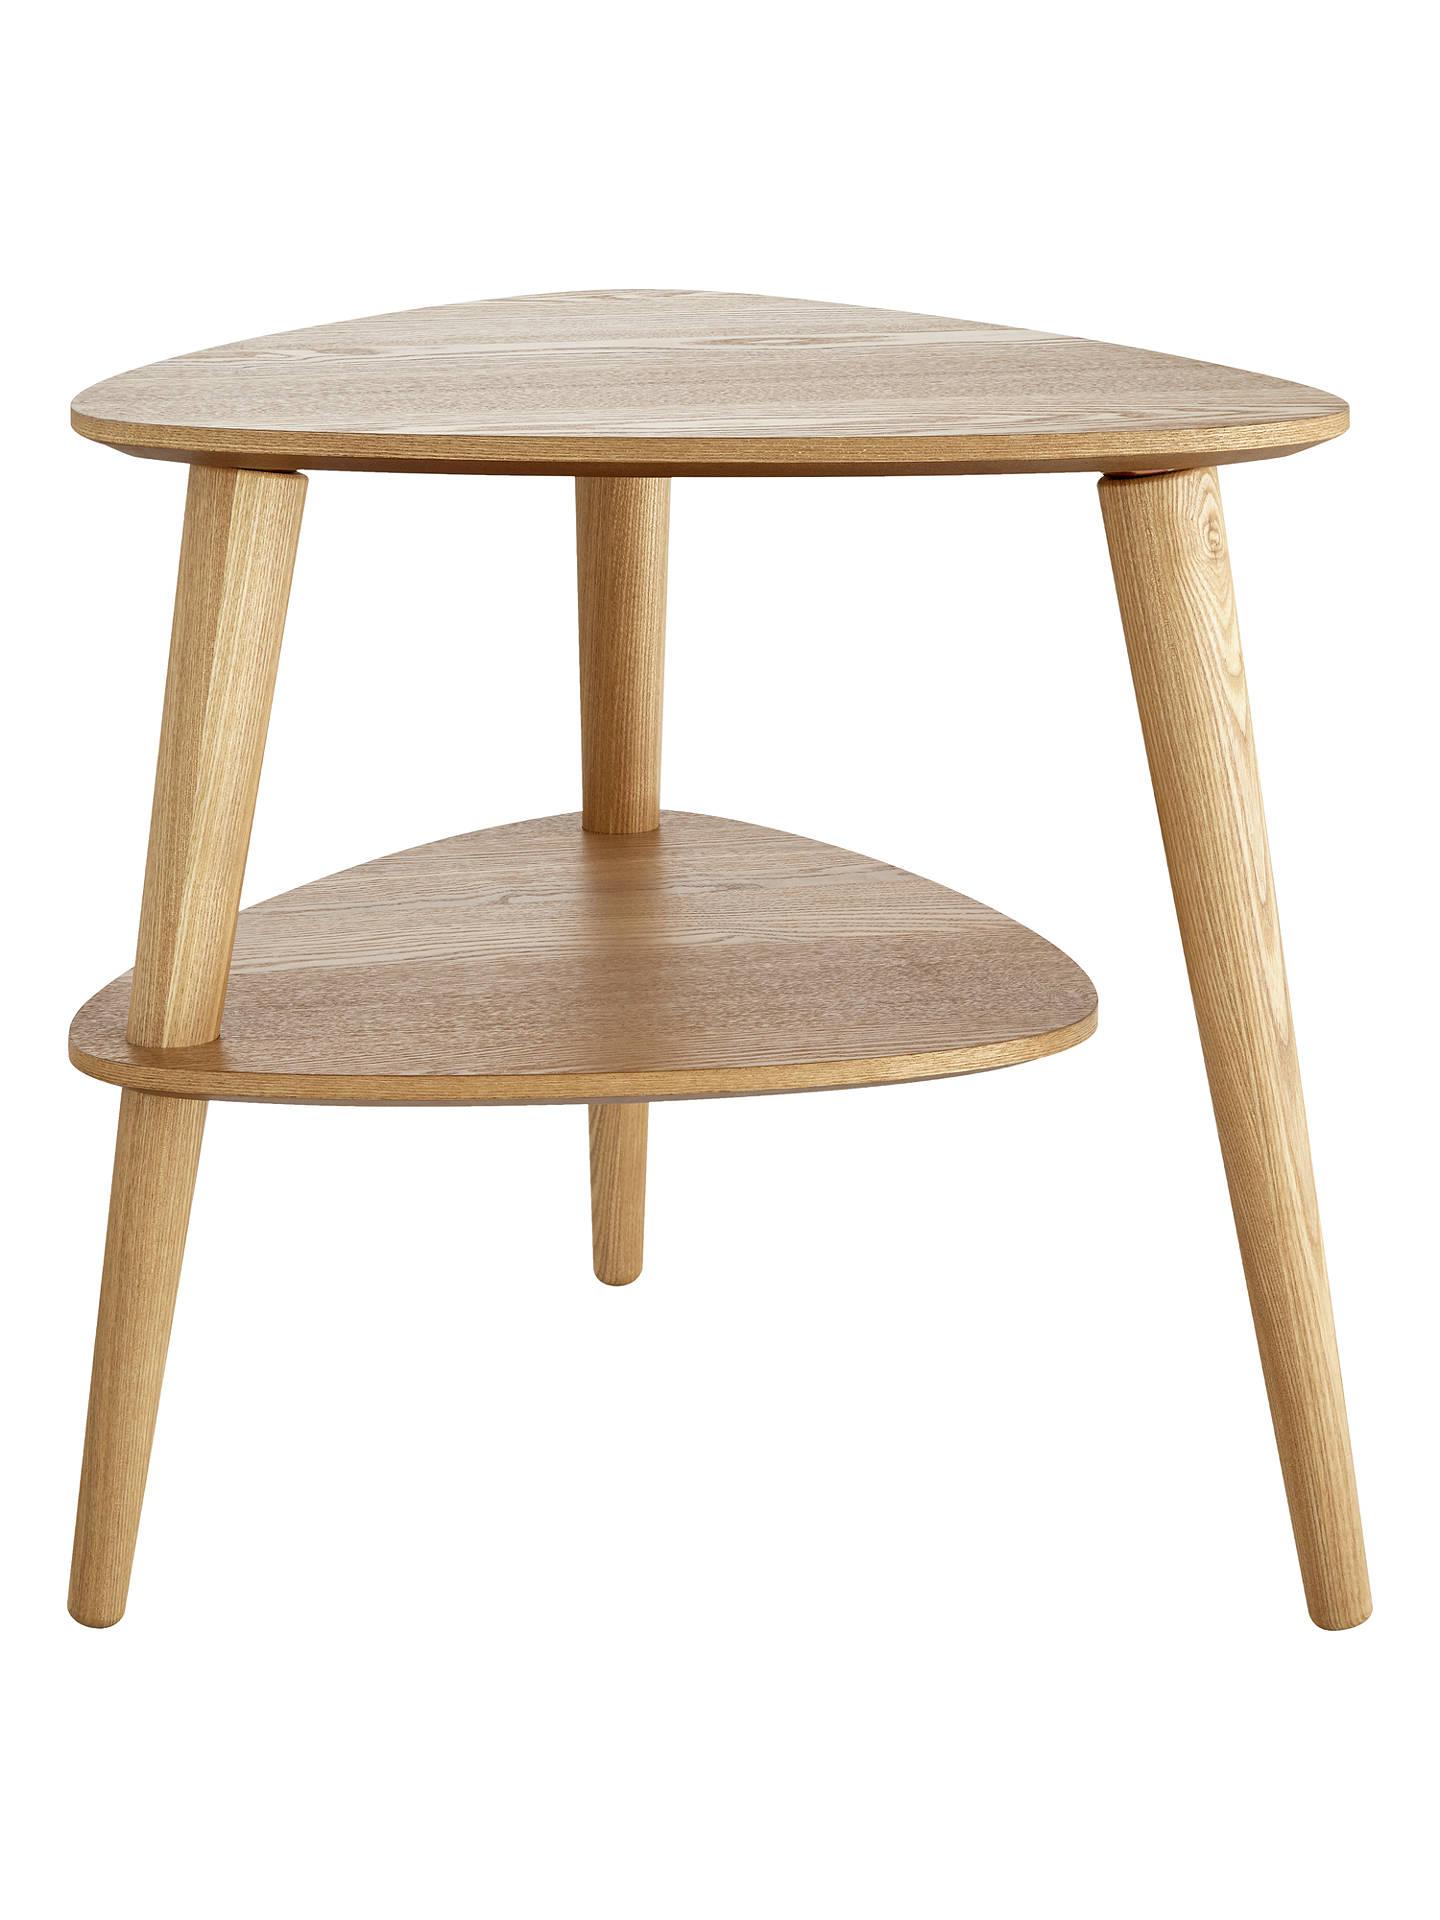 john lewis partners grayson side table at john lewis. Black Bedroom Furniture Sets. Home Design Ideas